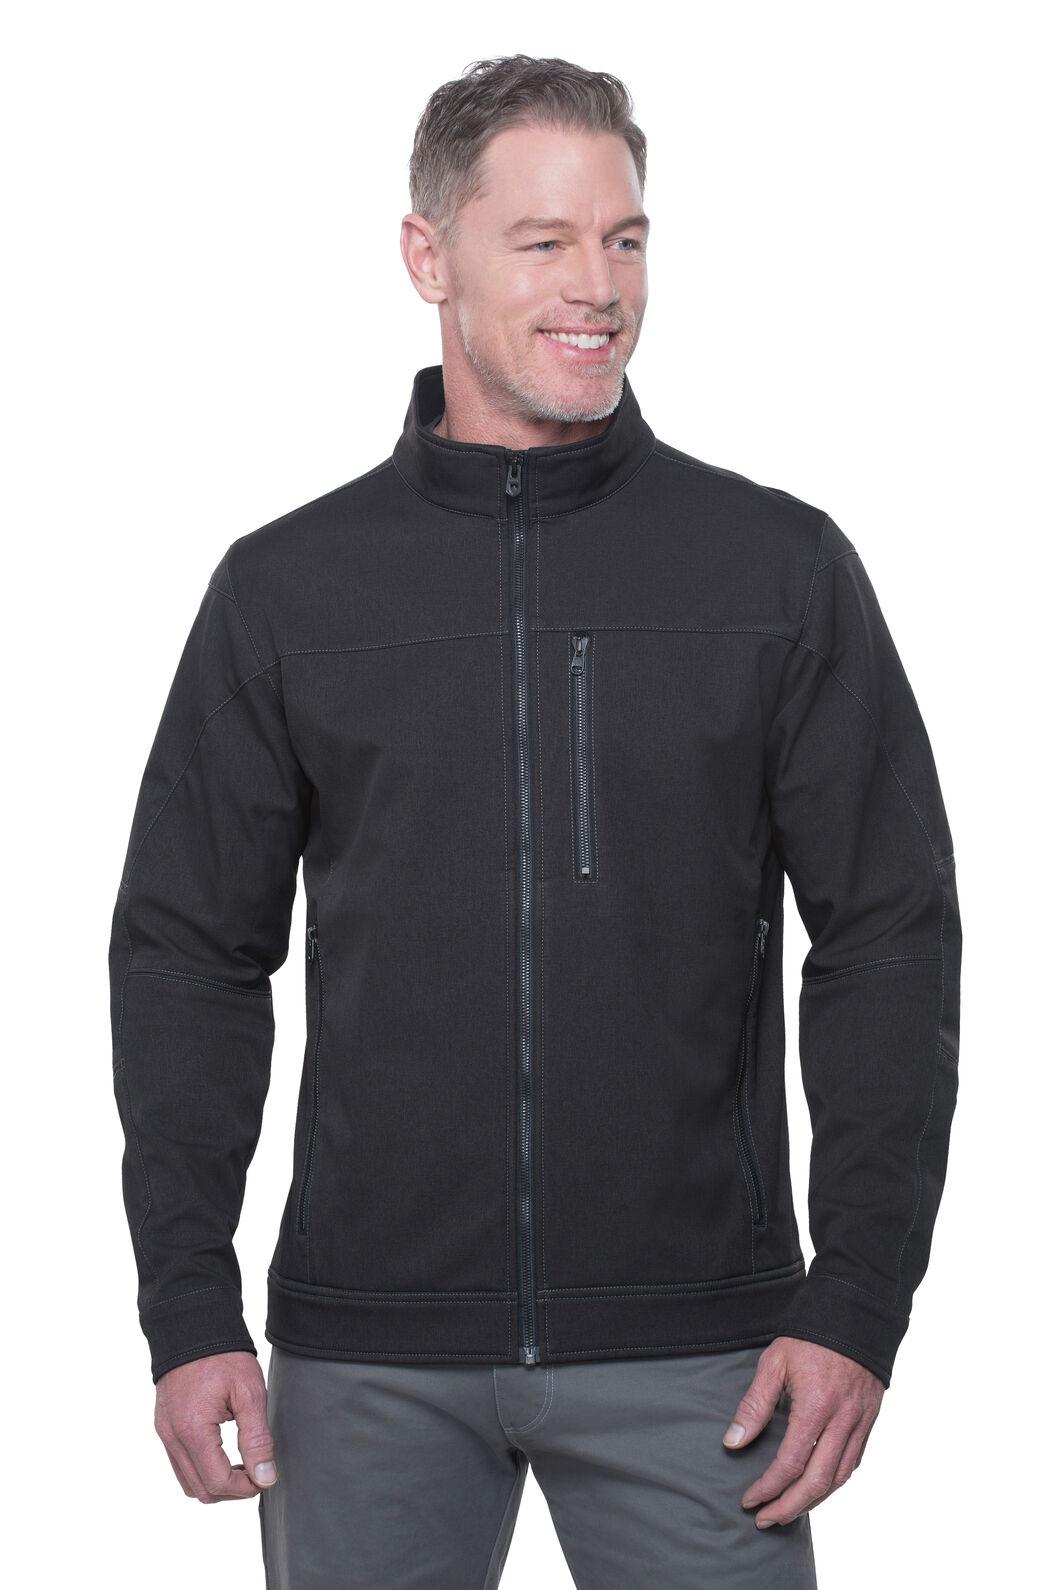 Kuhl Impakt Jacket - Men's, Black, hi-res